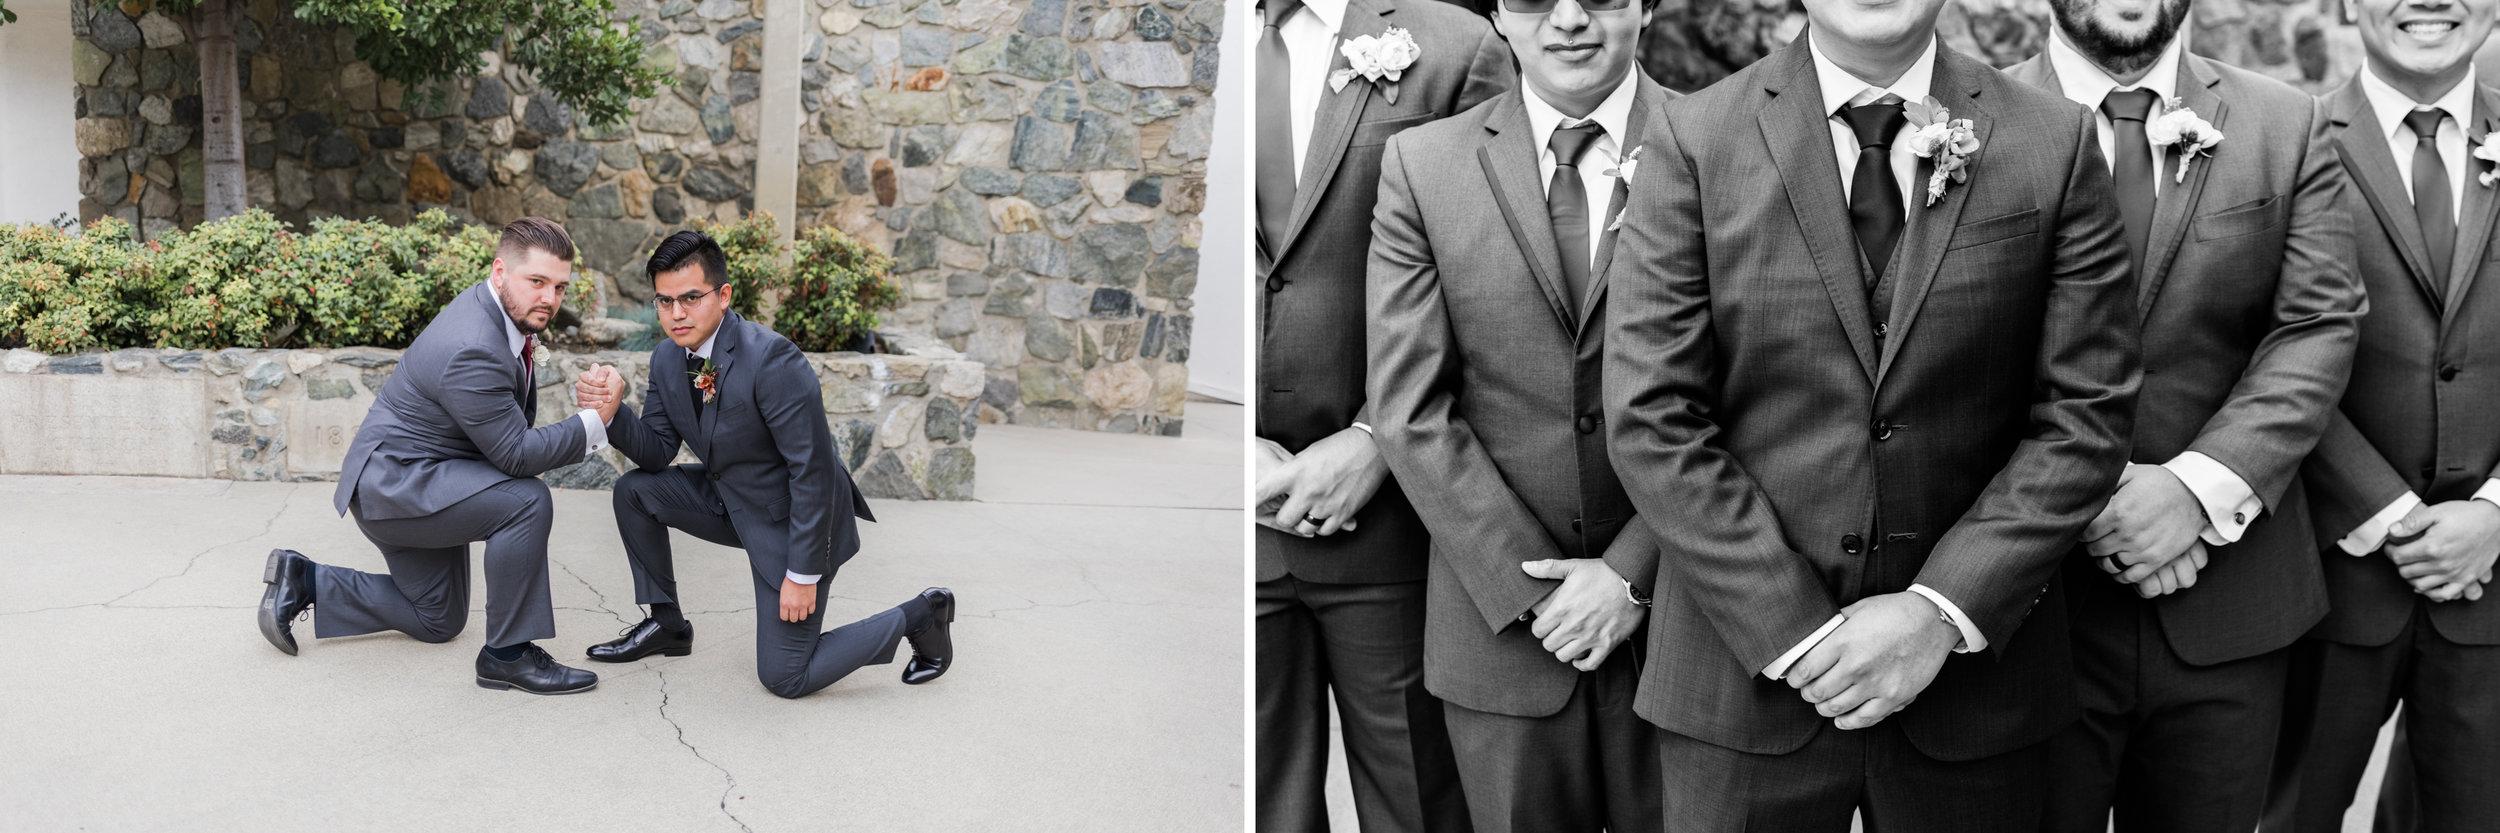 Kansas City Wedding Photographer 39.jpg